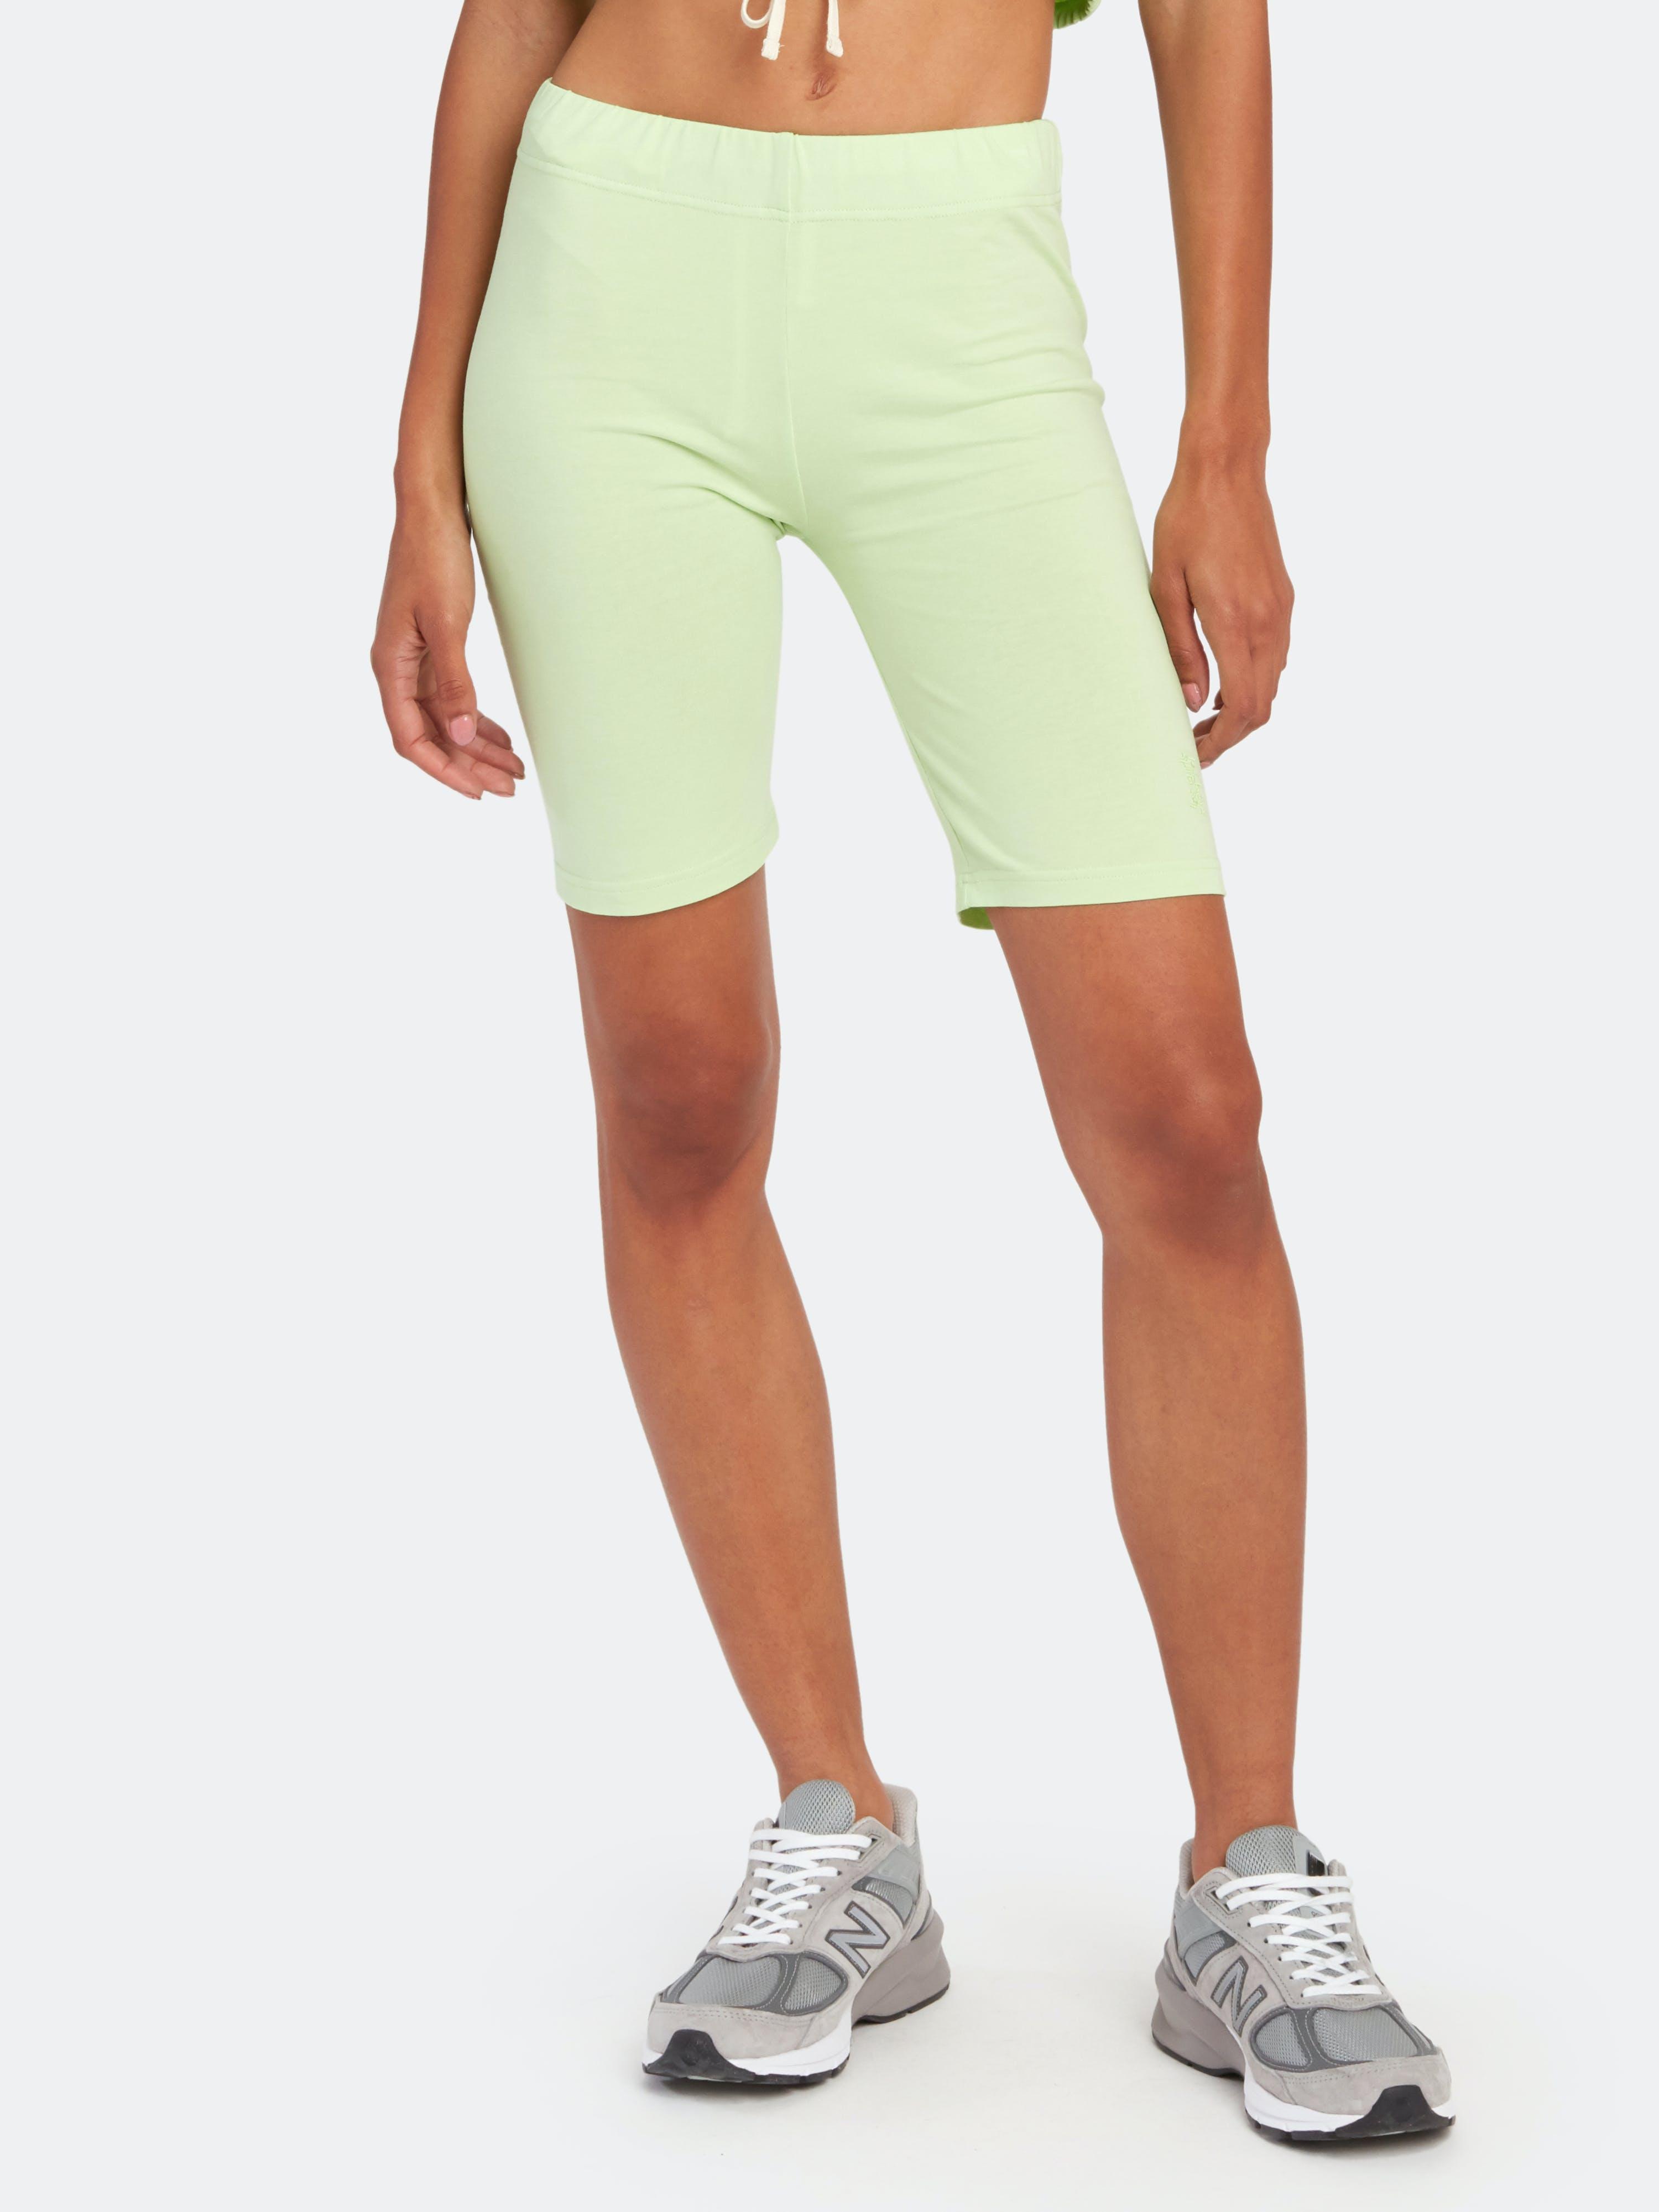 Les Girls Les Boys Tight Bike Shorts - M - Also in: XS, L, XL, S  - Green